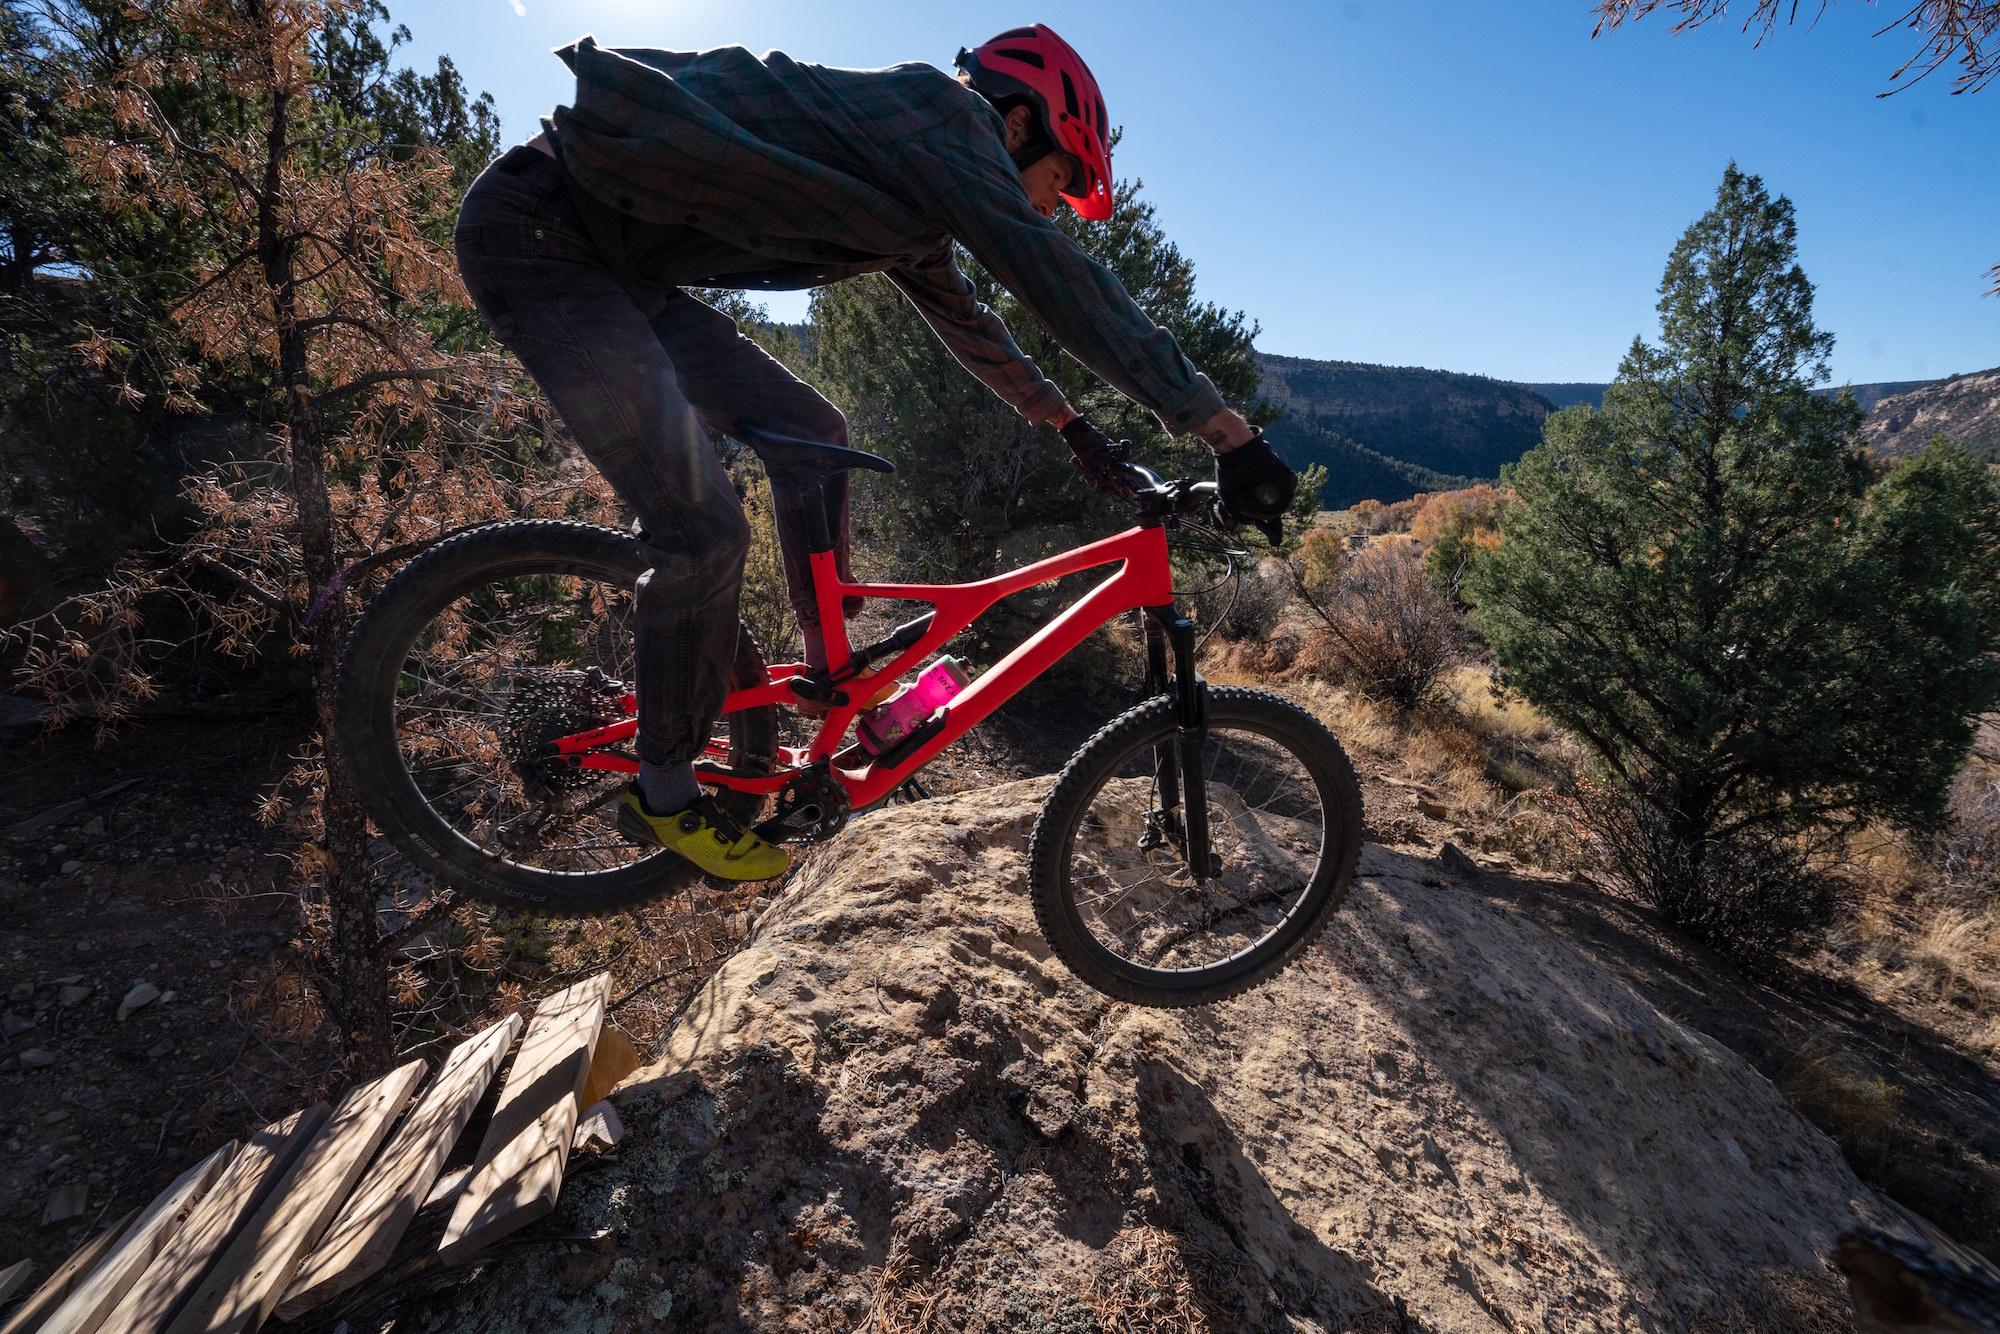 Steve on the Scullbinder Ranch mountain bike trails.